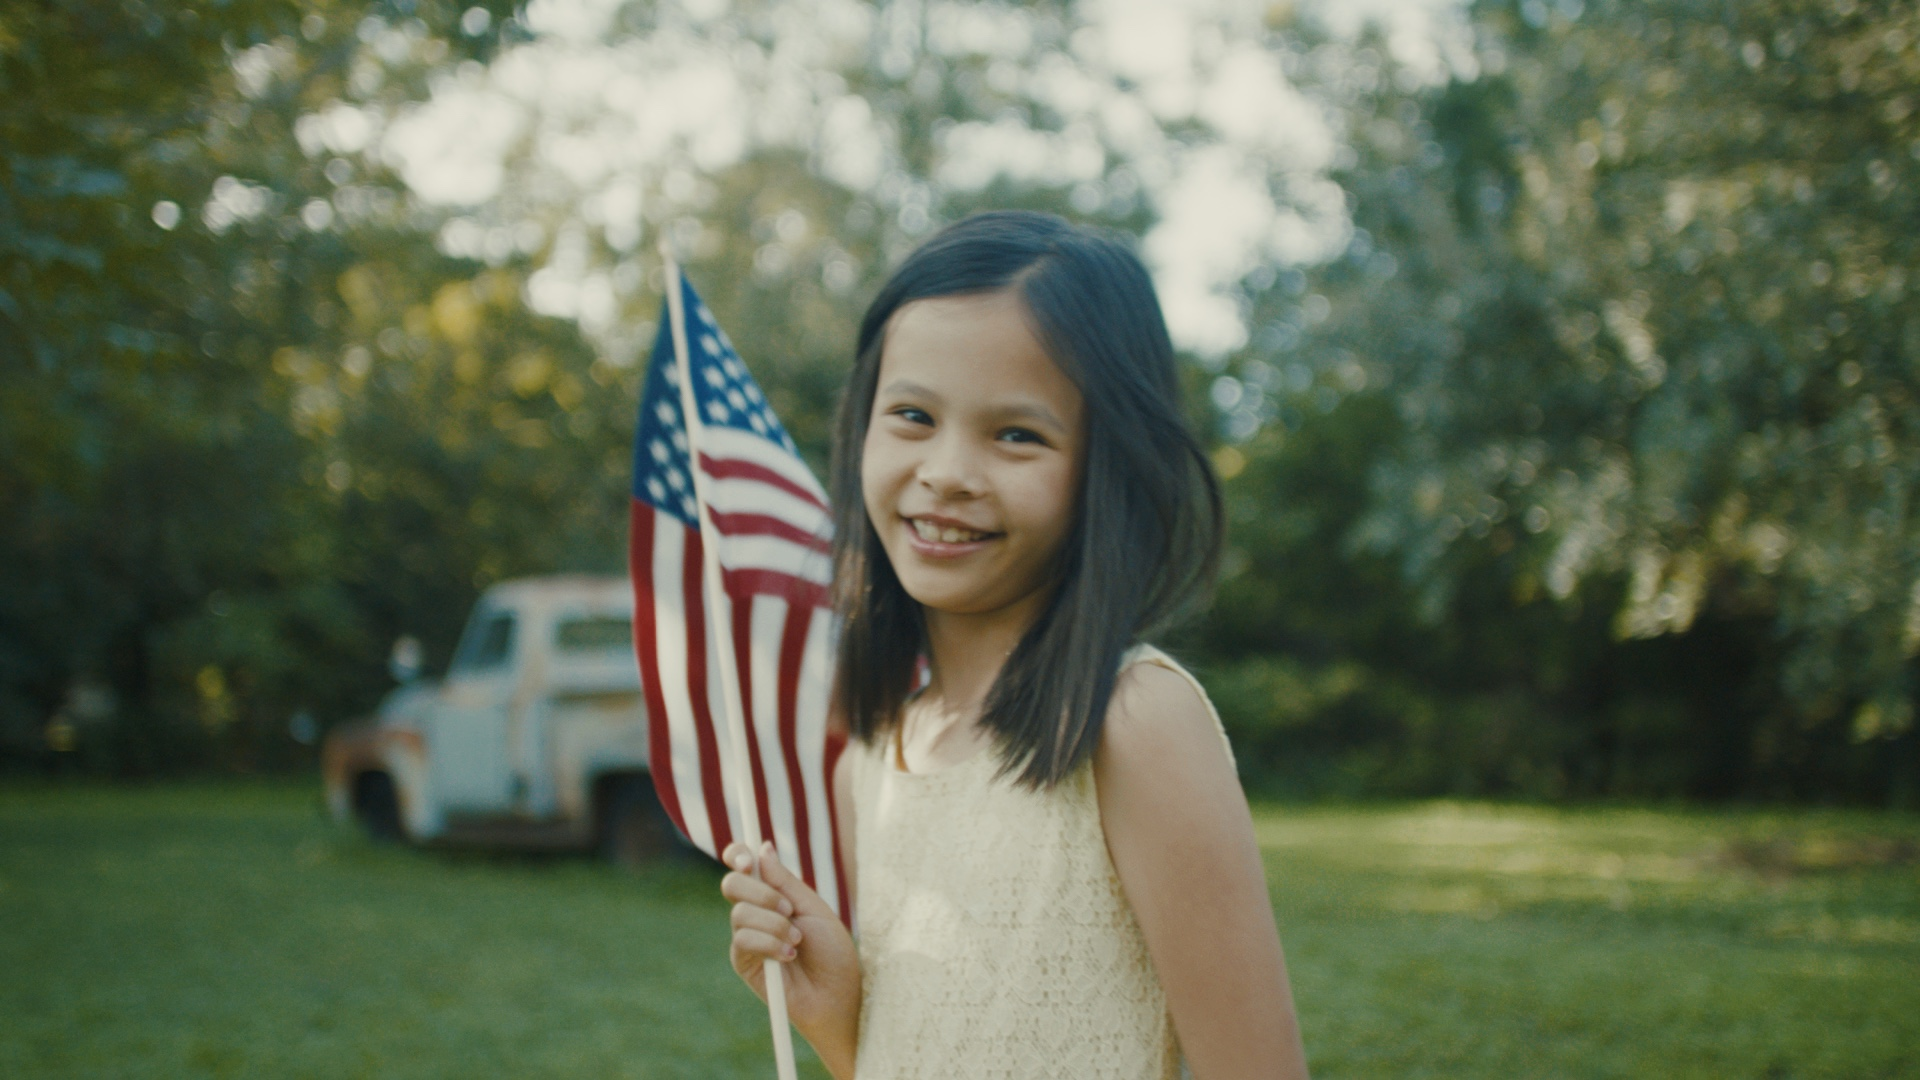 AmericanGirl_Pic.jpg